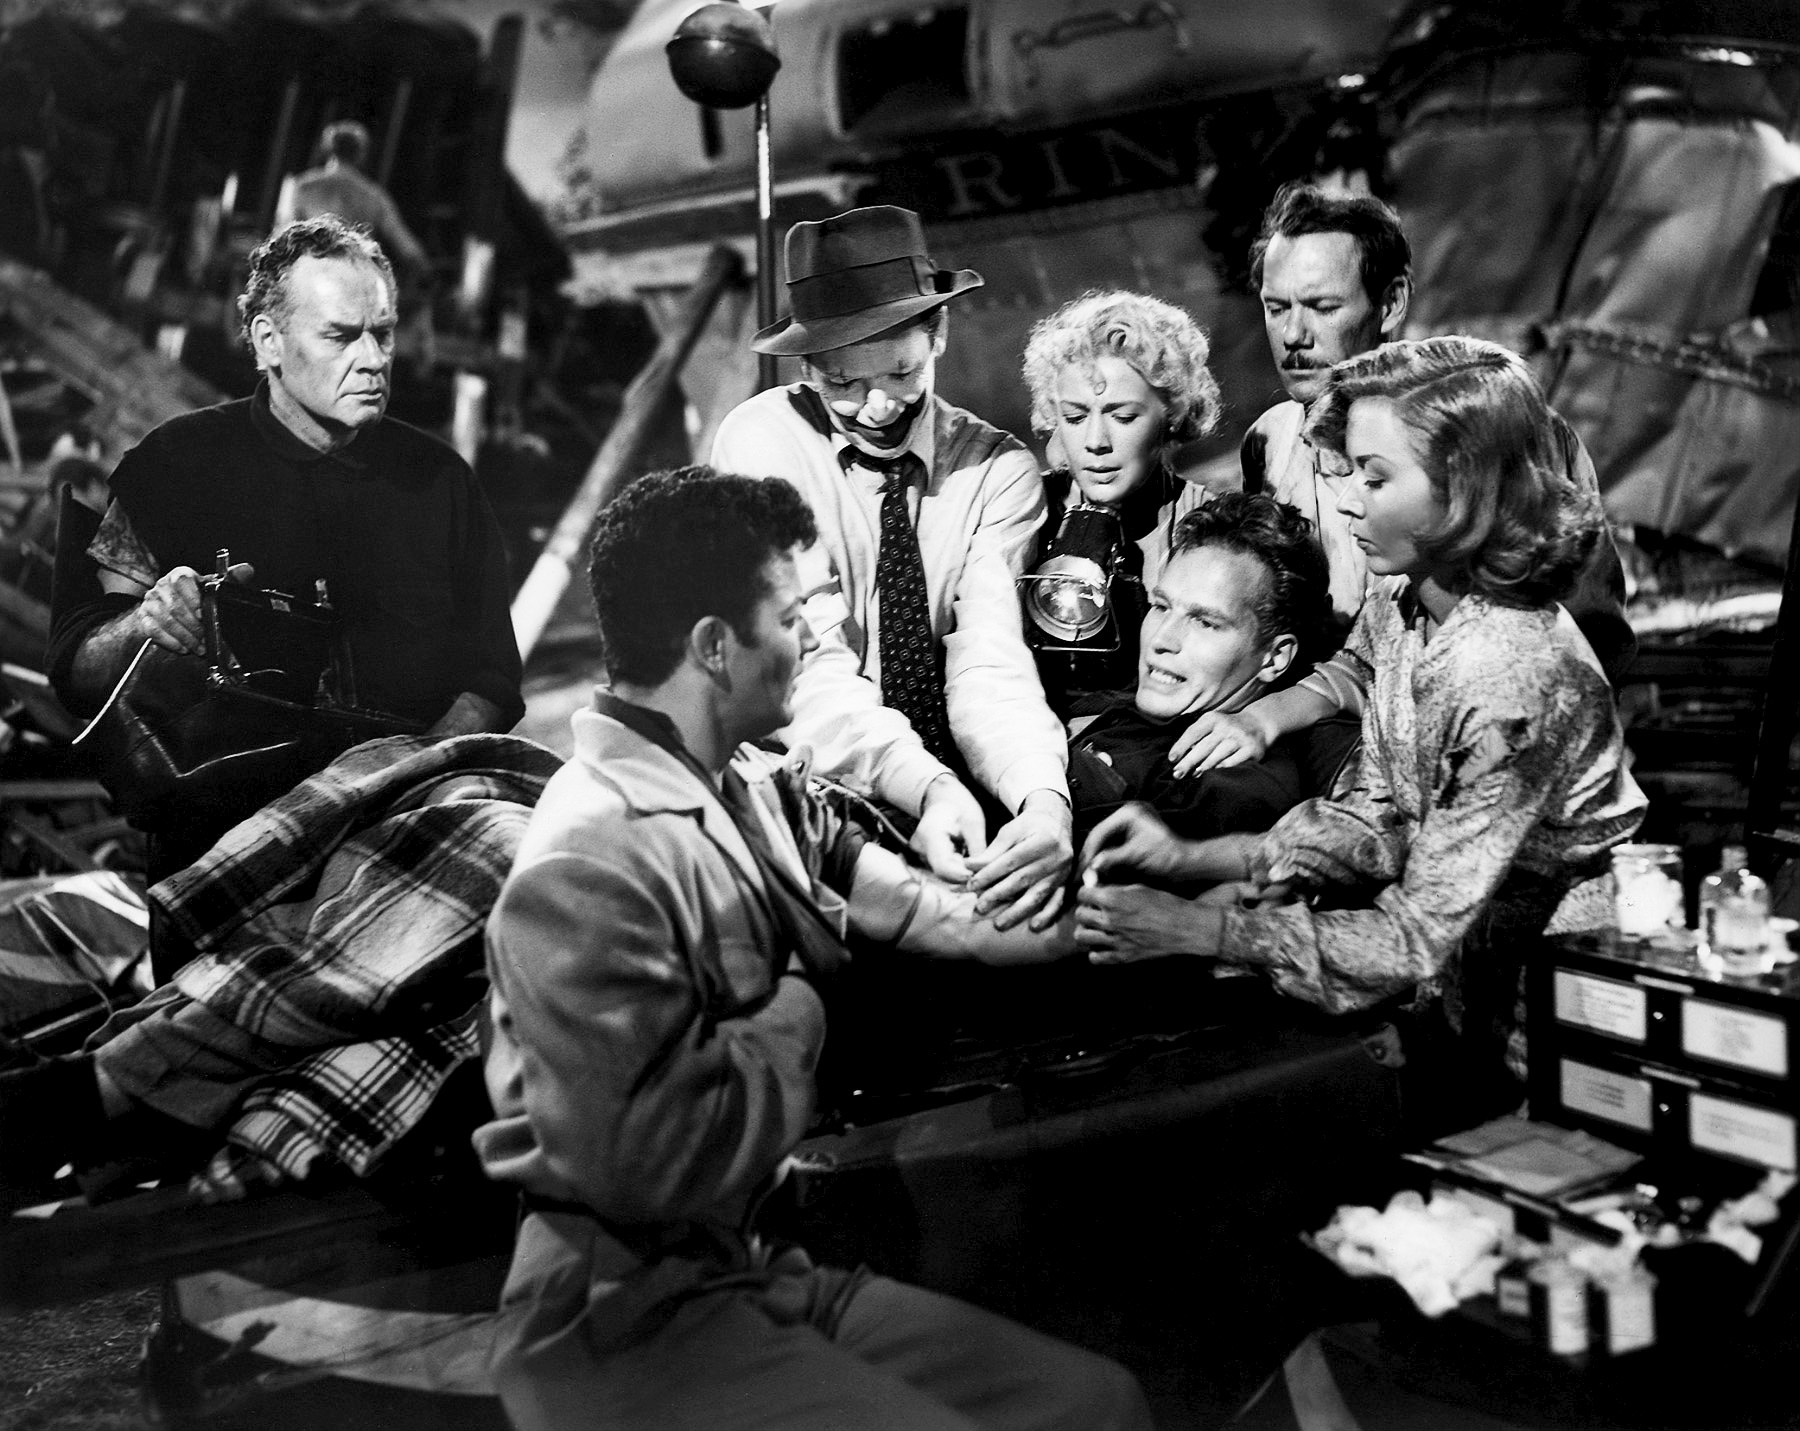 lane chandler, cornel wilde, james stewart, betty hutton, charlton heston, john ridgely & gloria grahame – the greatest show on earth 1952